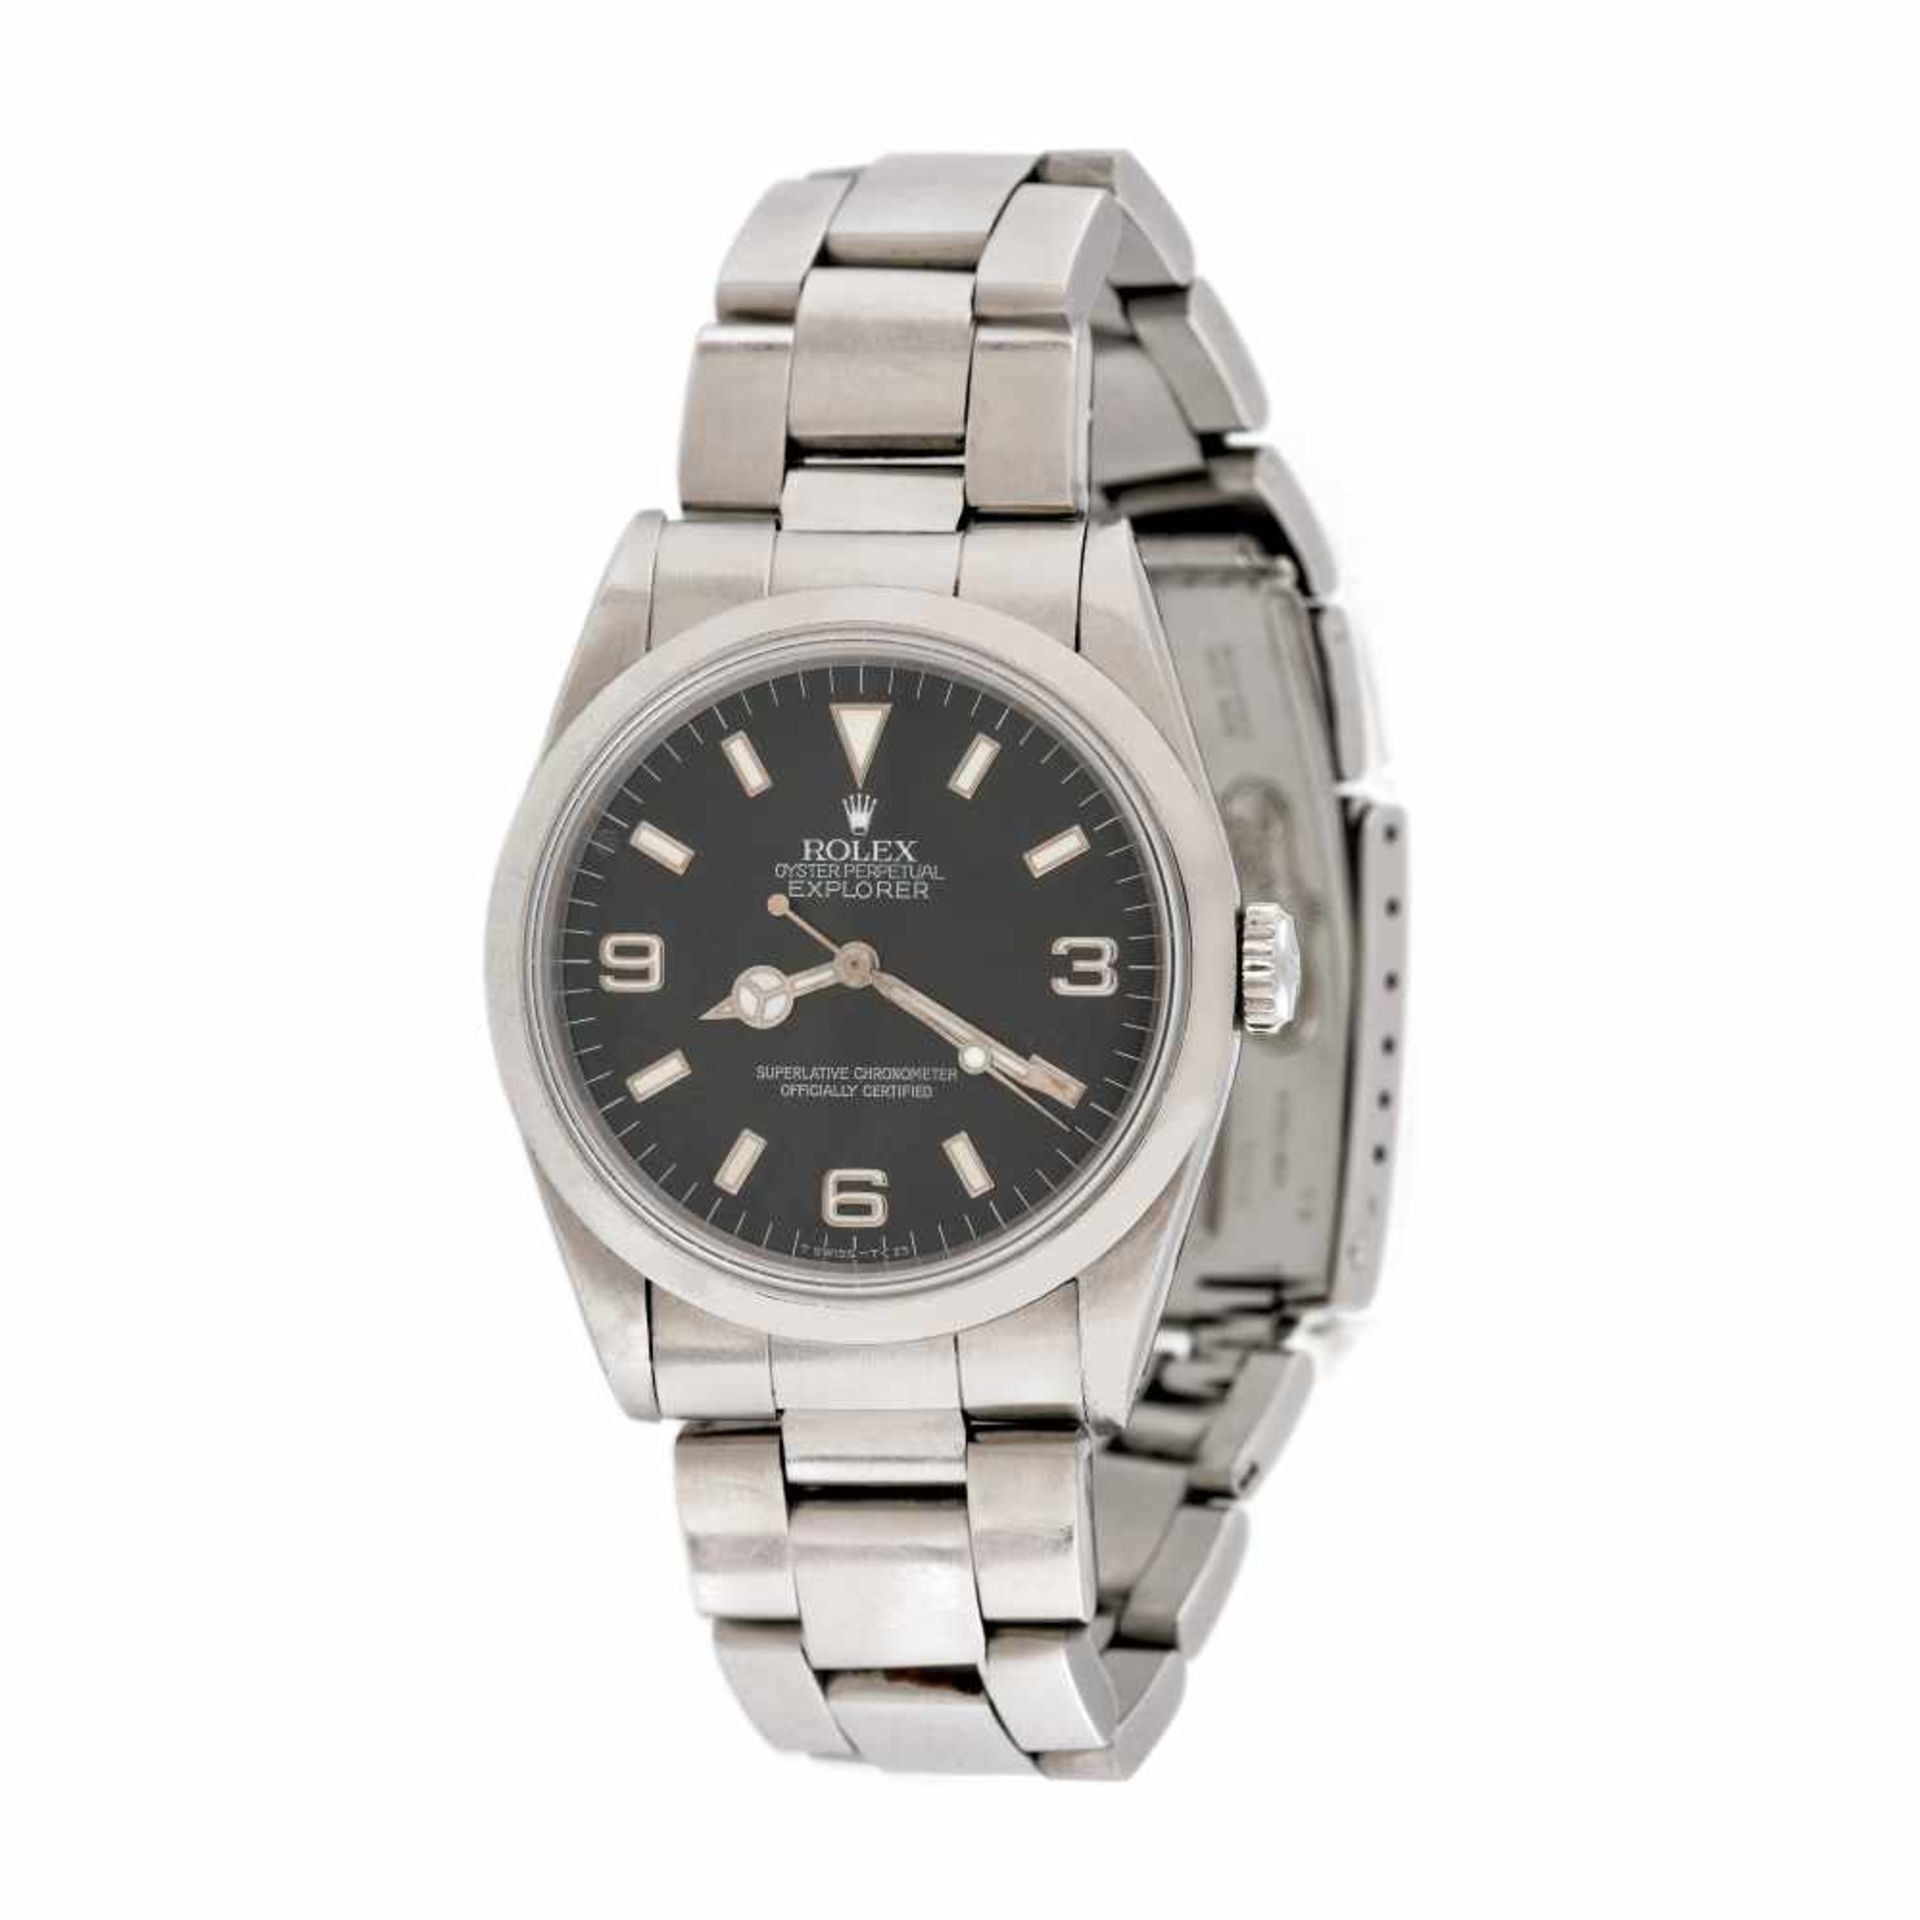 Rolex Explorer vintage wristwatch, men